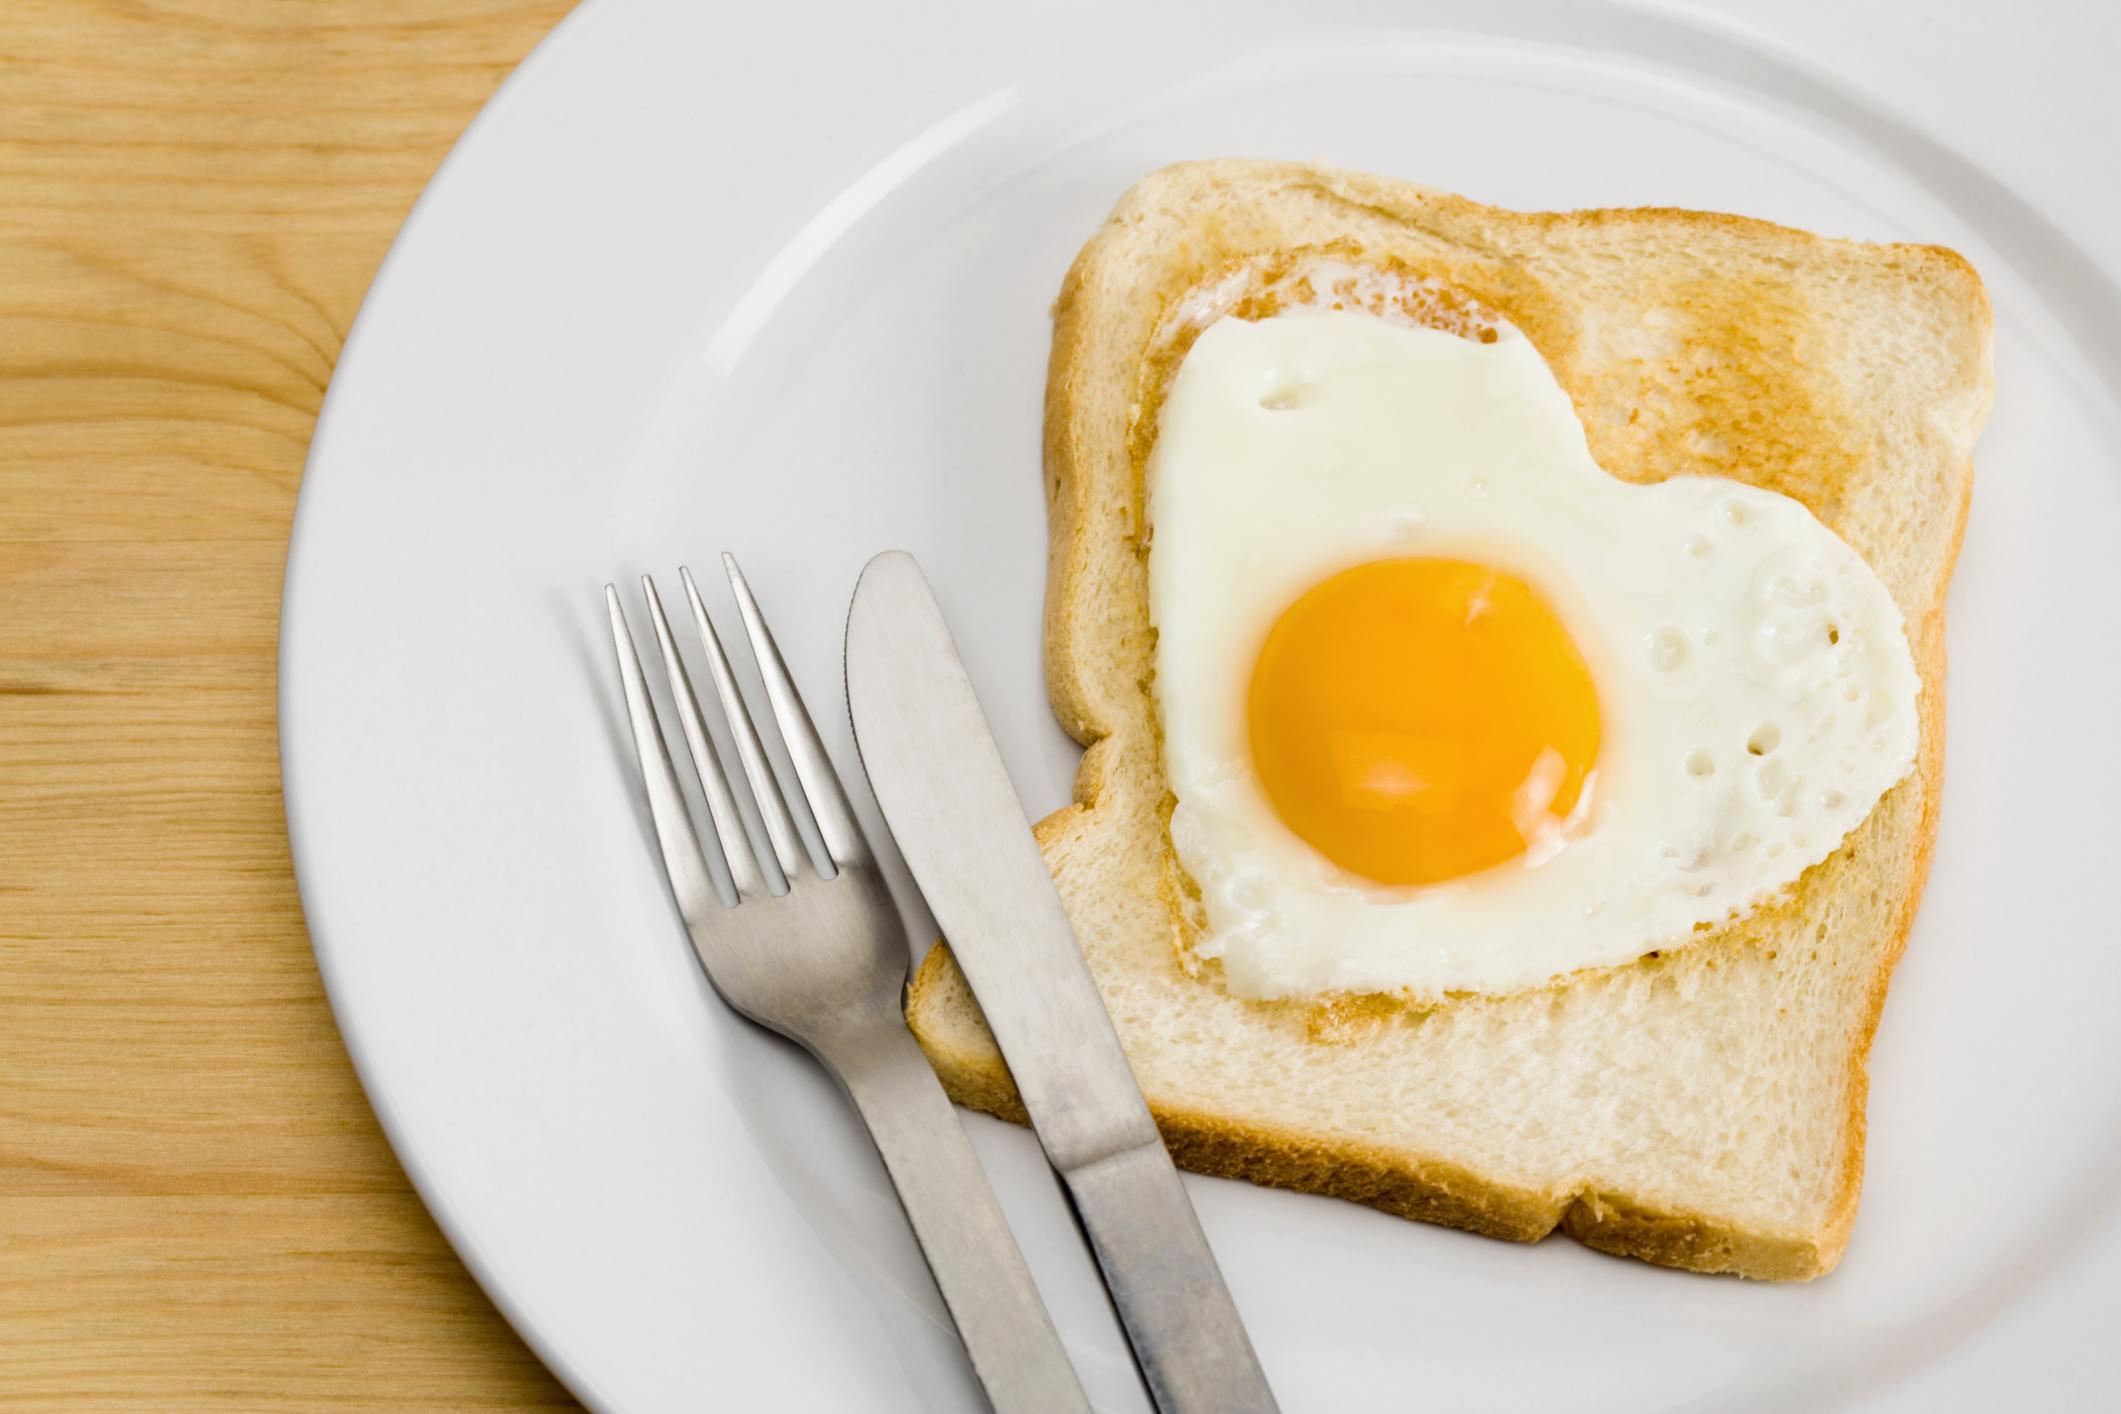 Valentine's Day Food: Breakfast to Dinner